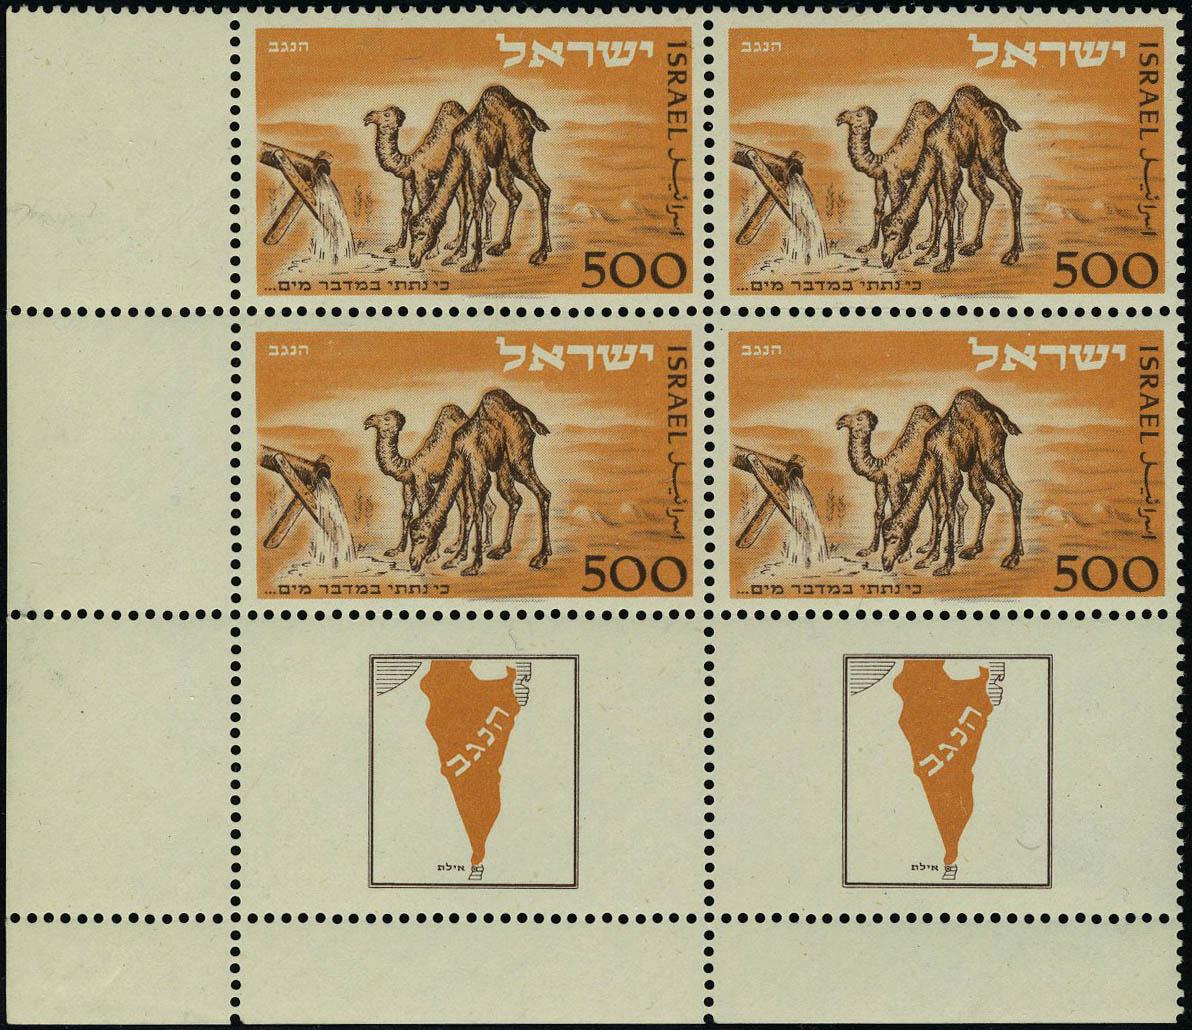 Lot 3335 - Israel  -  Francois Feldman F.C.N.P François FELDMAN sale #127